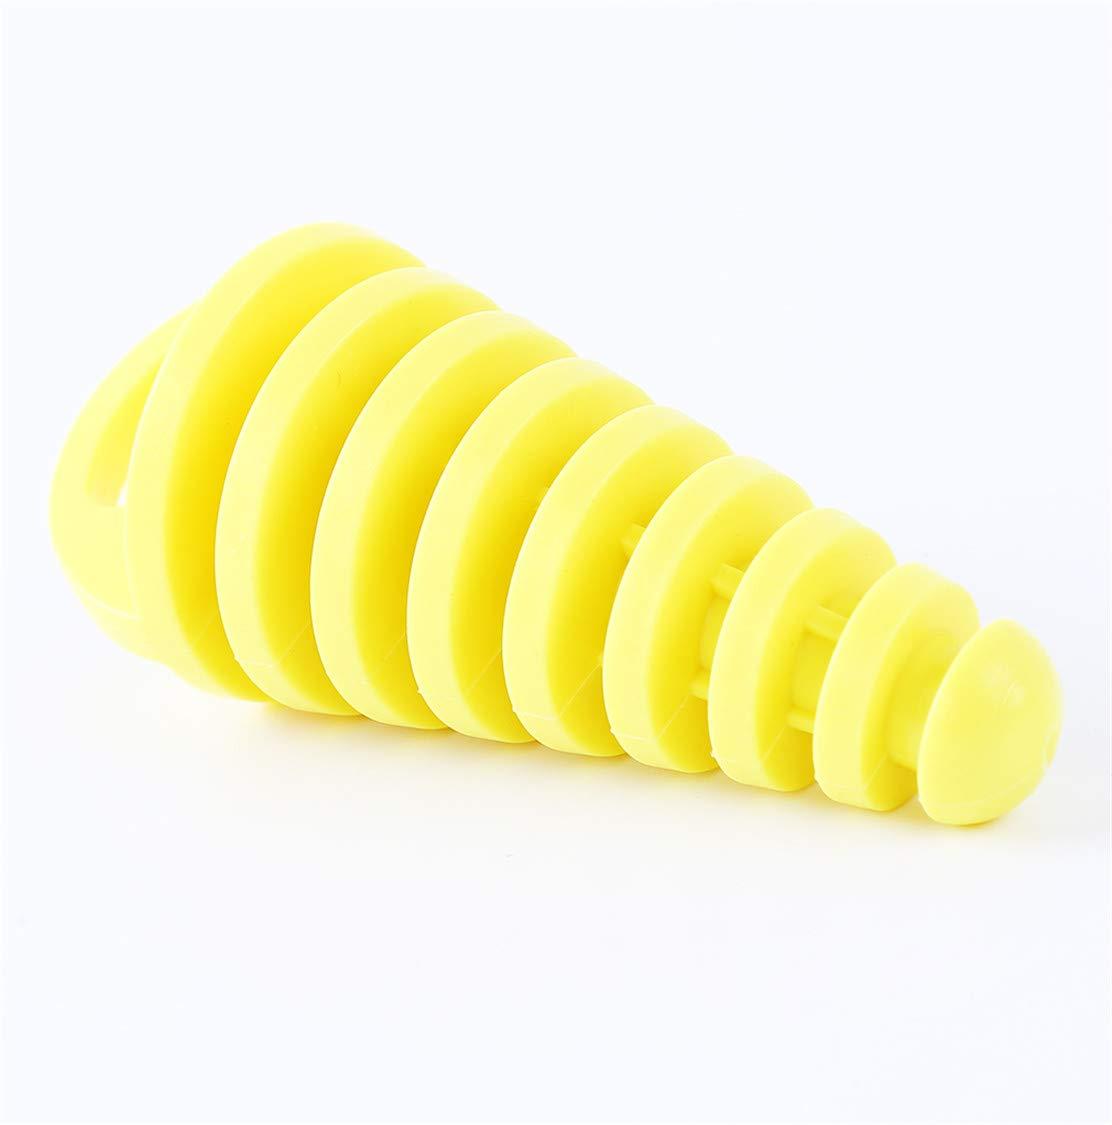 Idiytip Muffler Pipe Exhaust Silencer Wash Plug for Motorcycle Dirt Bike Yellow